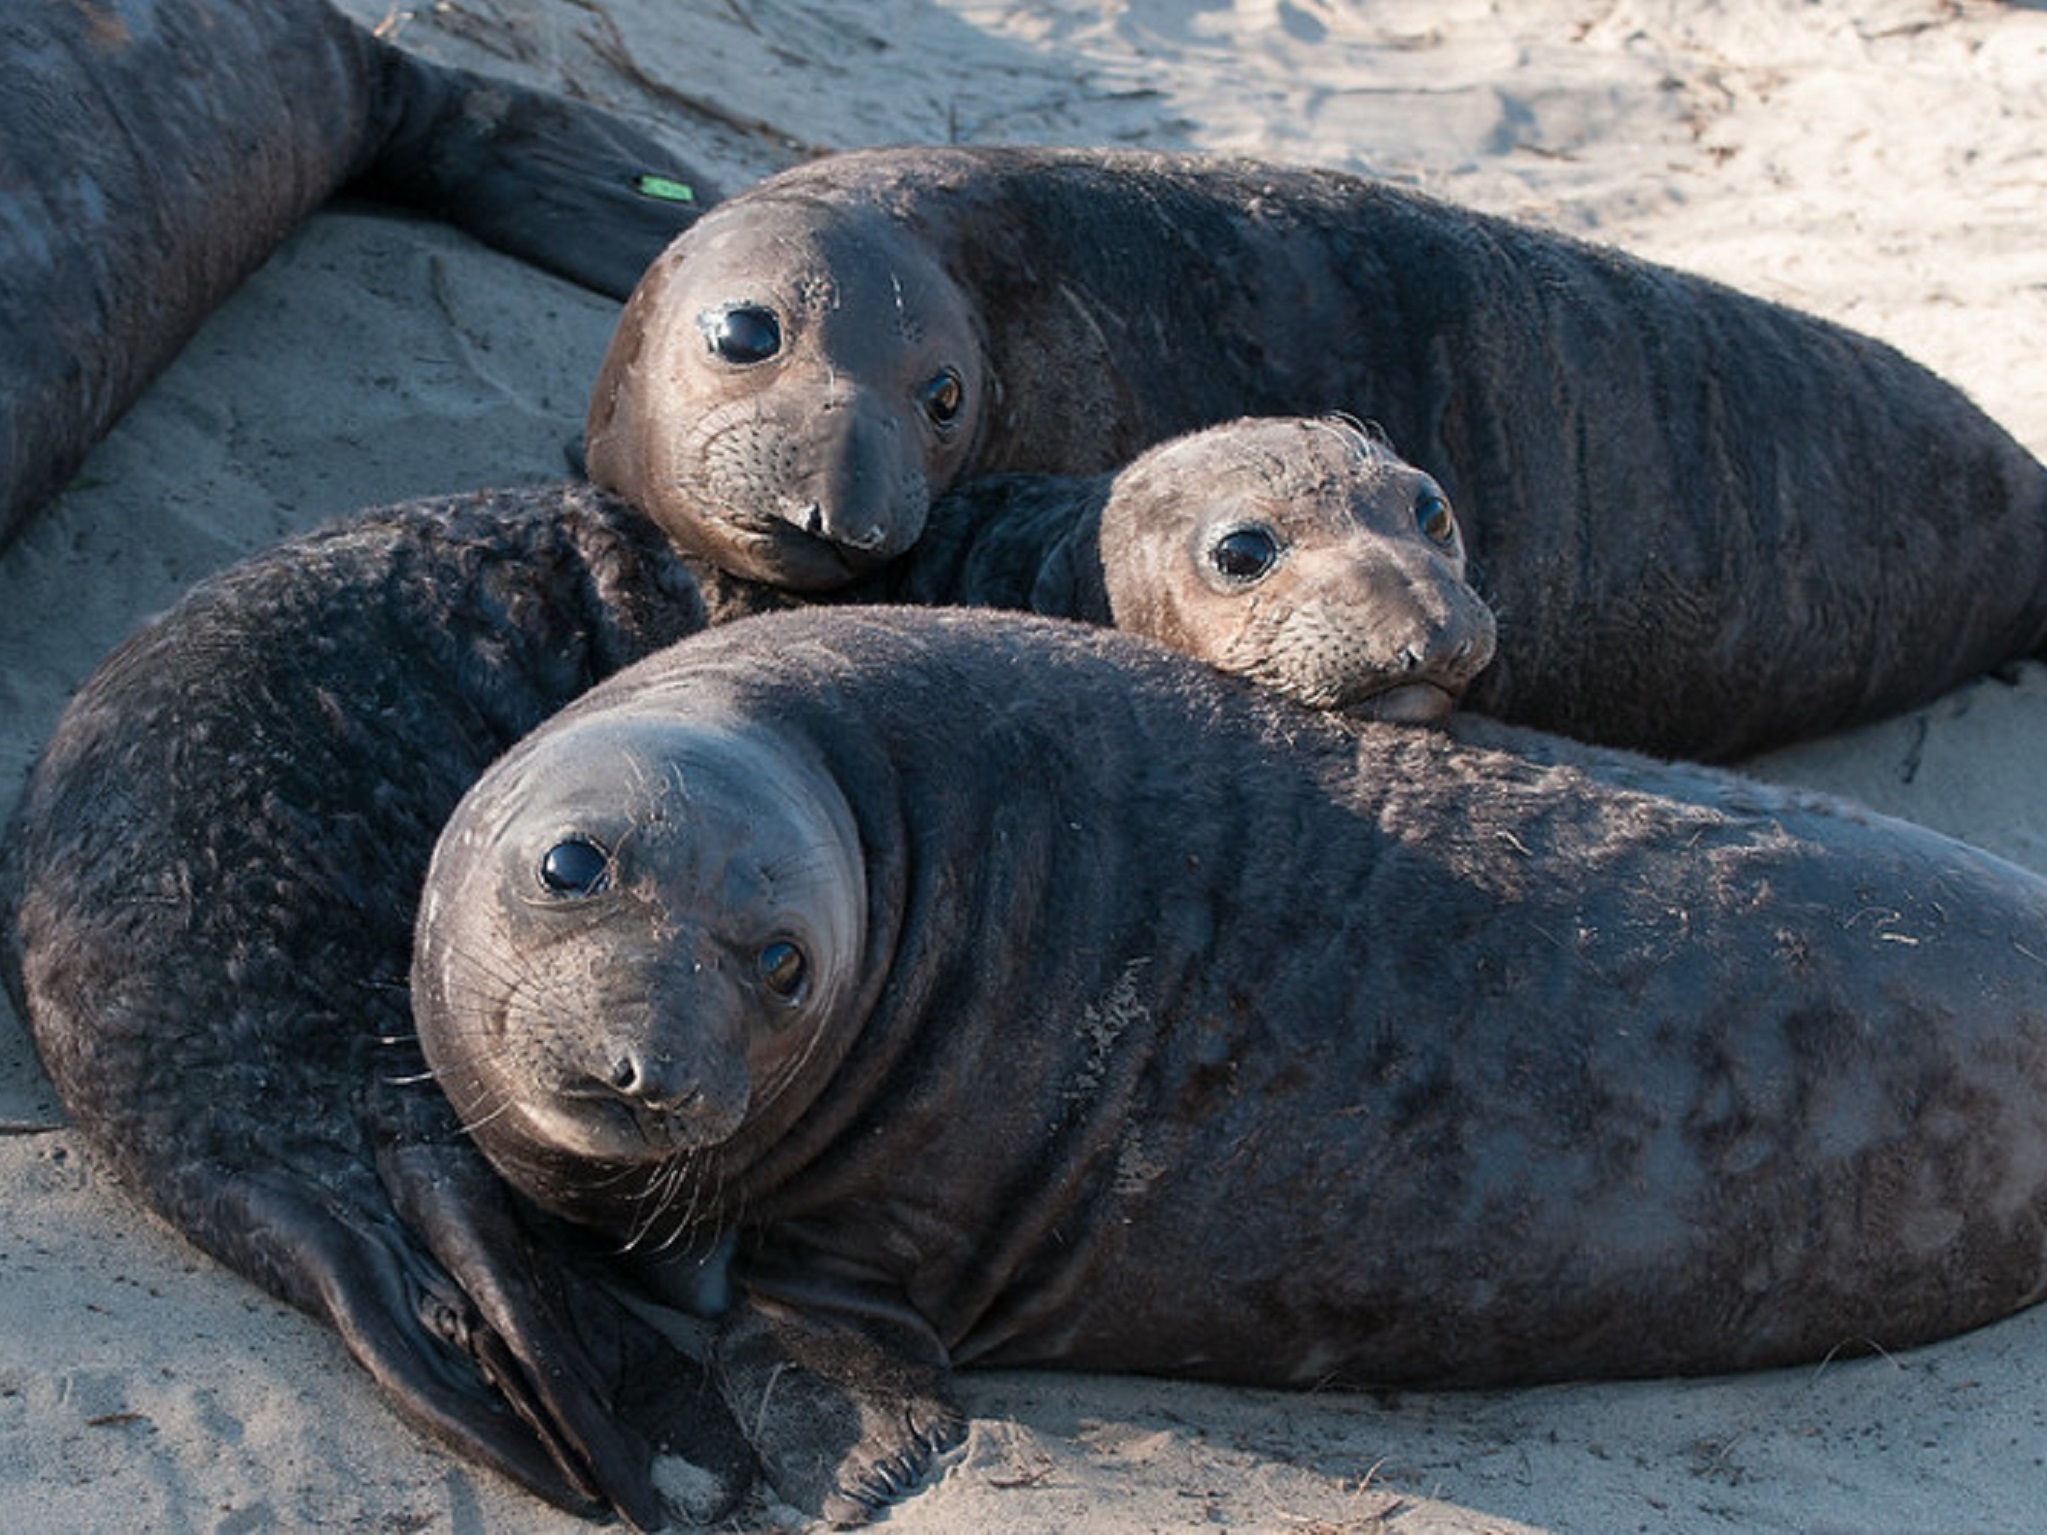 Three elephant seal pups on the beach